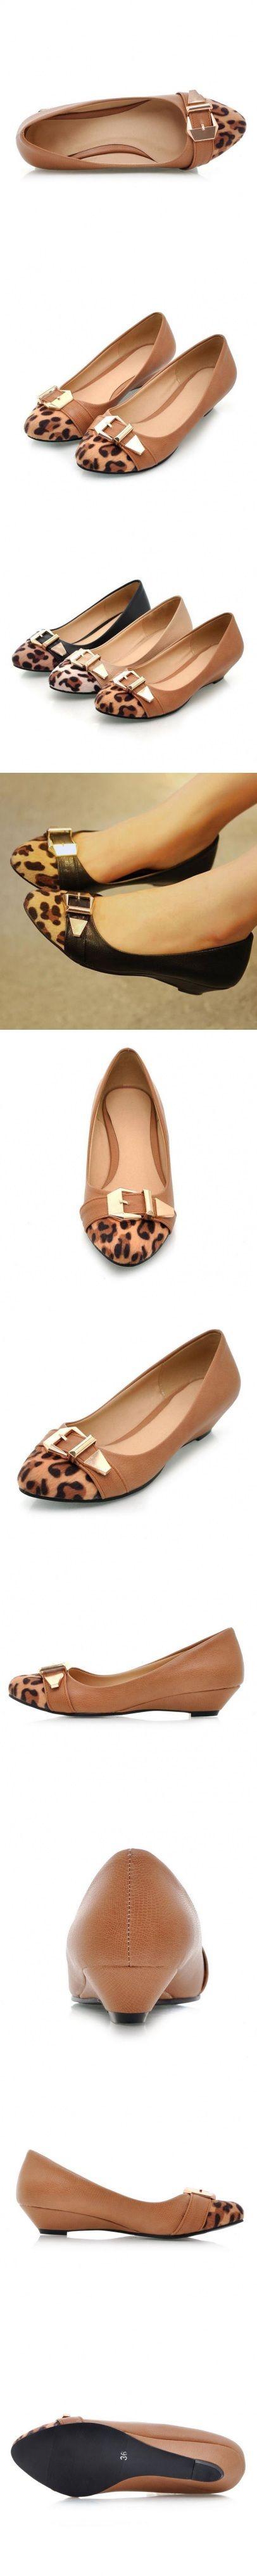 Gold Boots And Shoes Regarding Ordinary Sandal Shoe Women Junior Plastic Vintage...